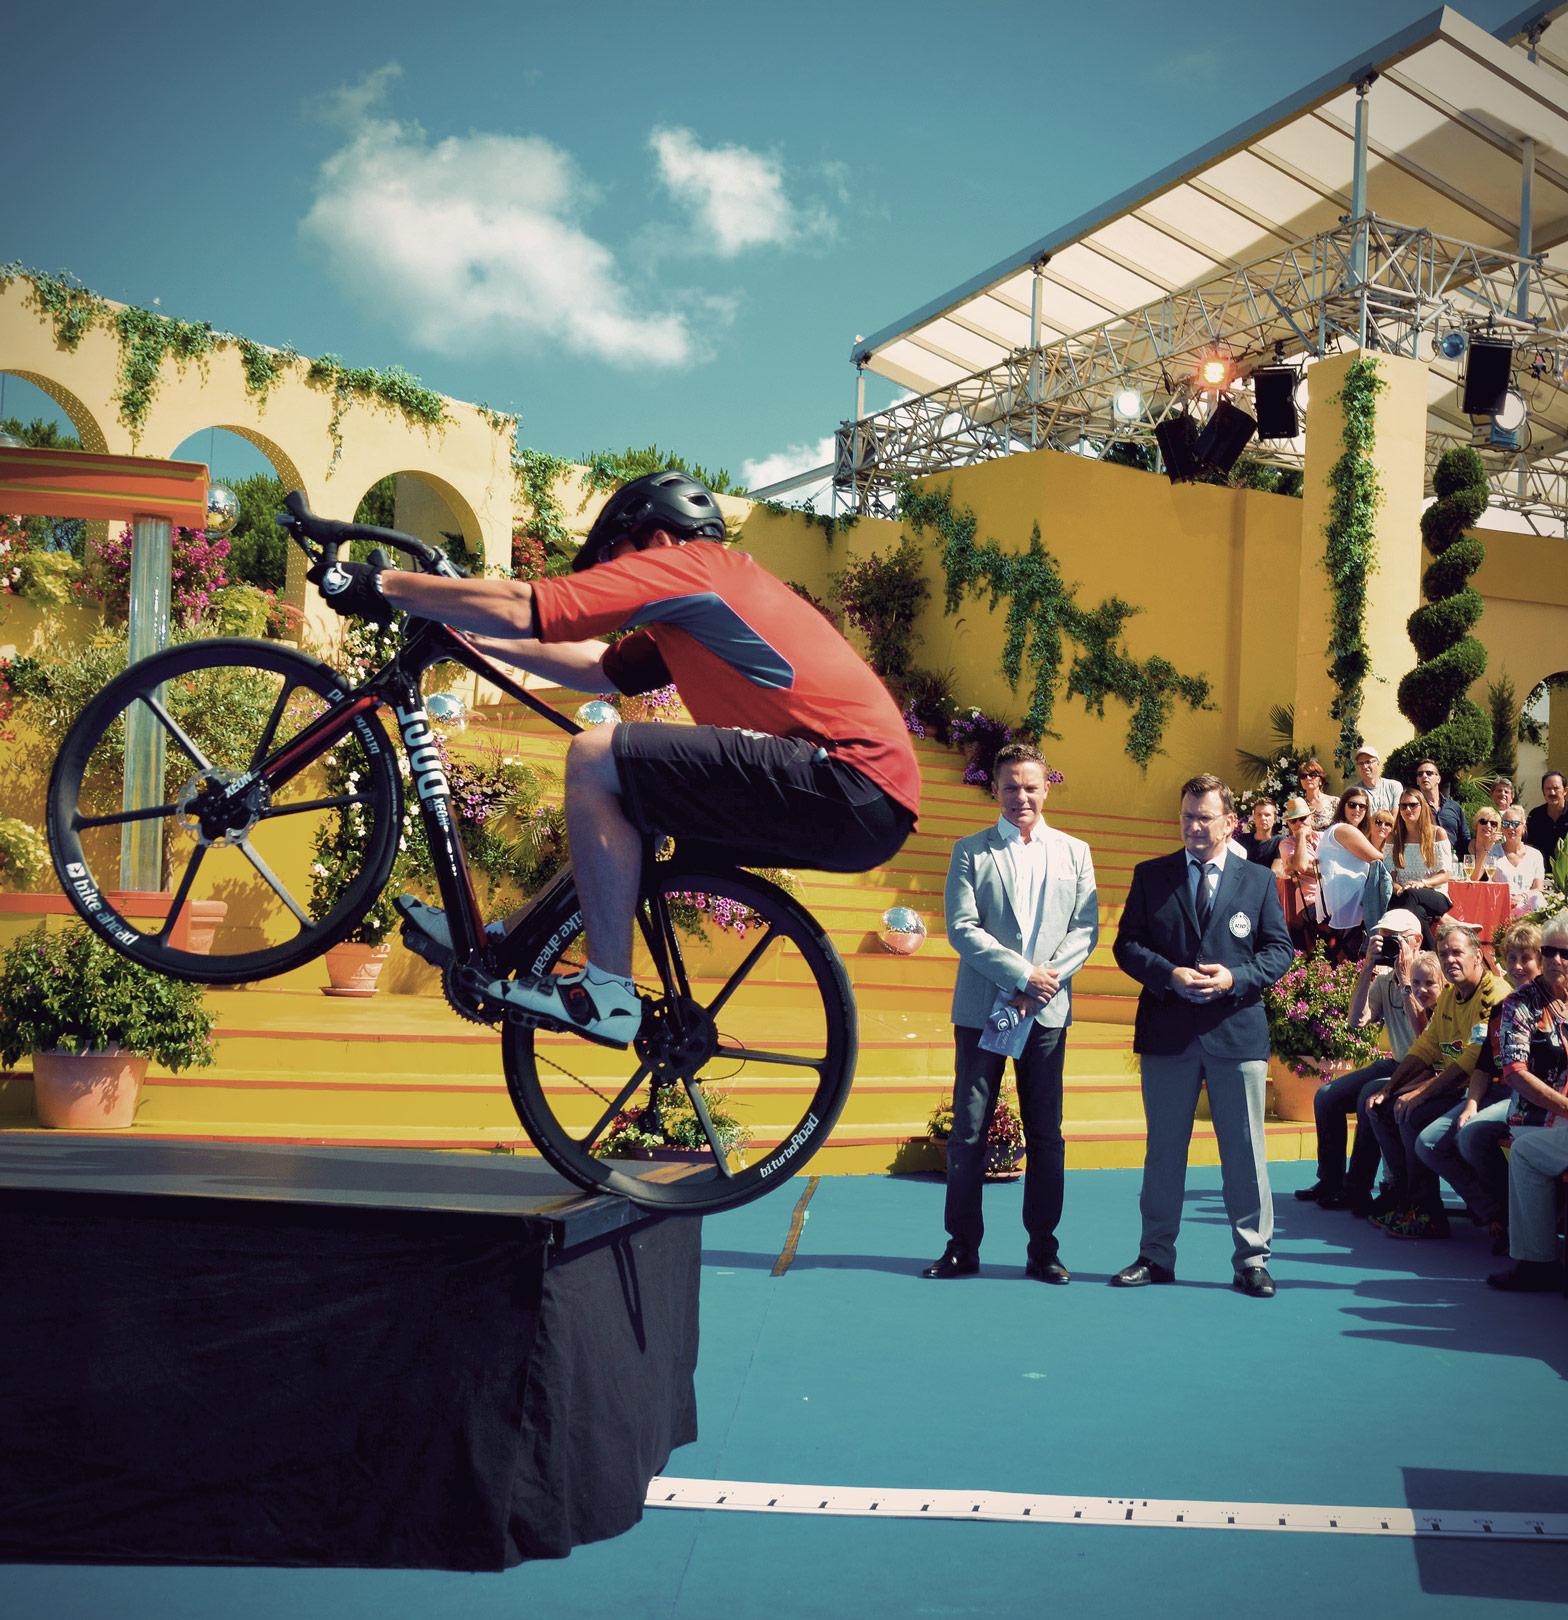 max Schrom world record